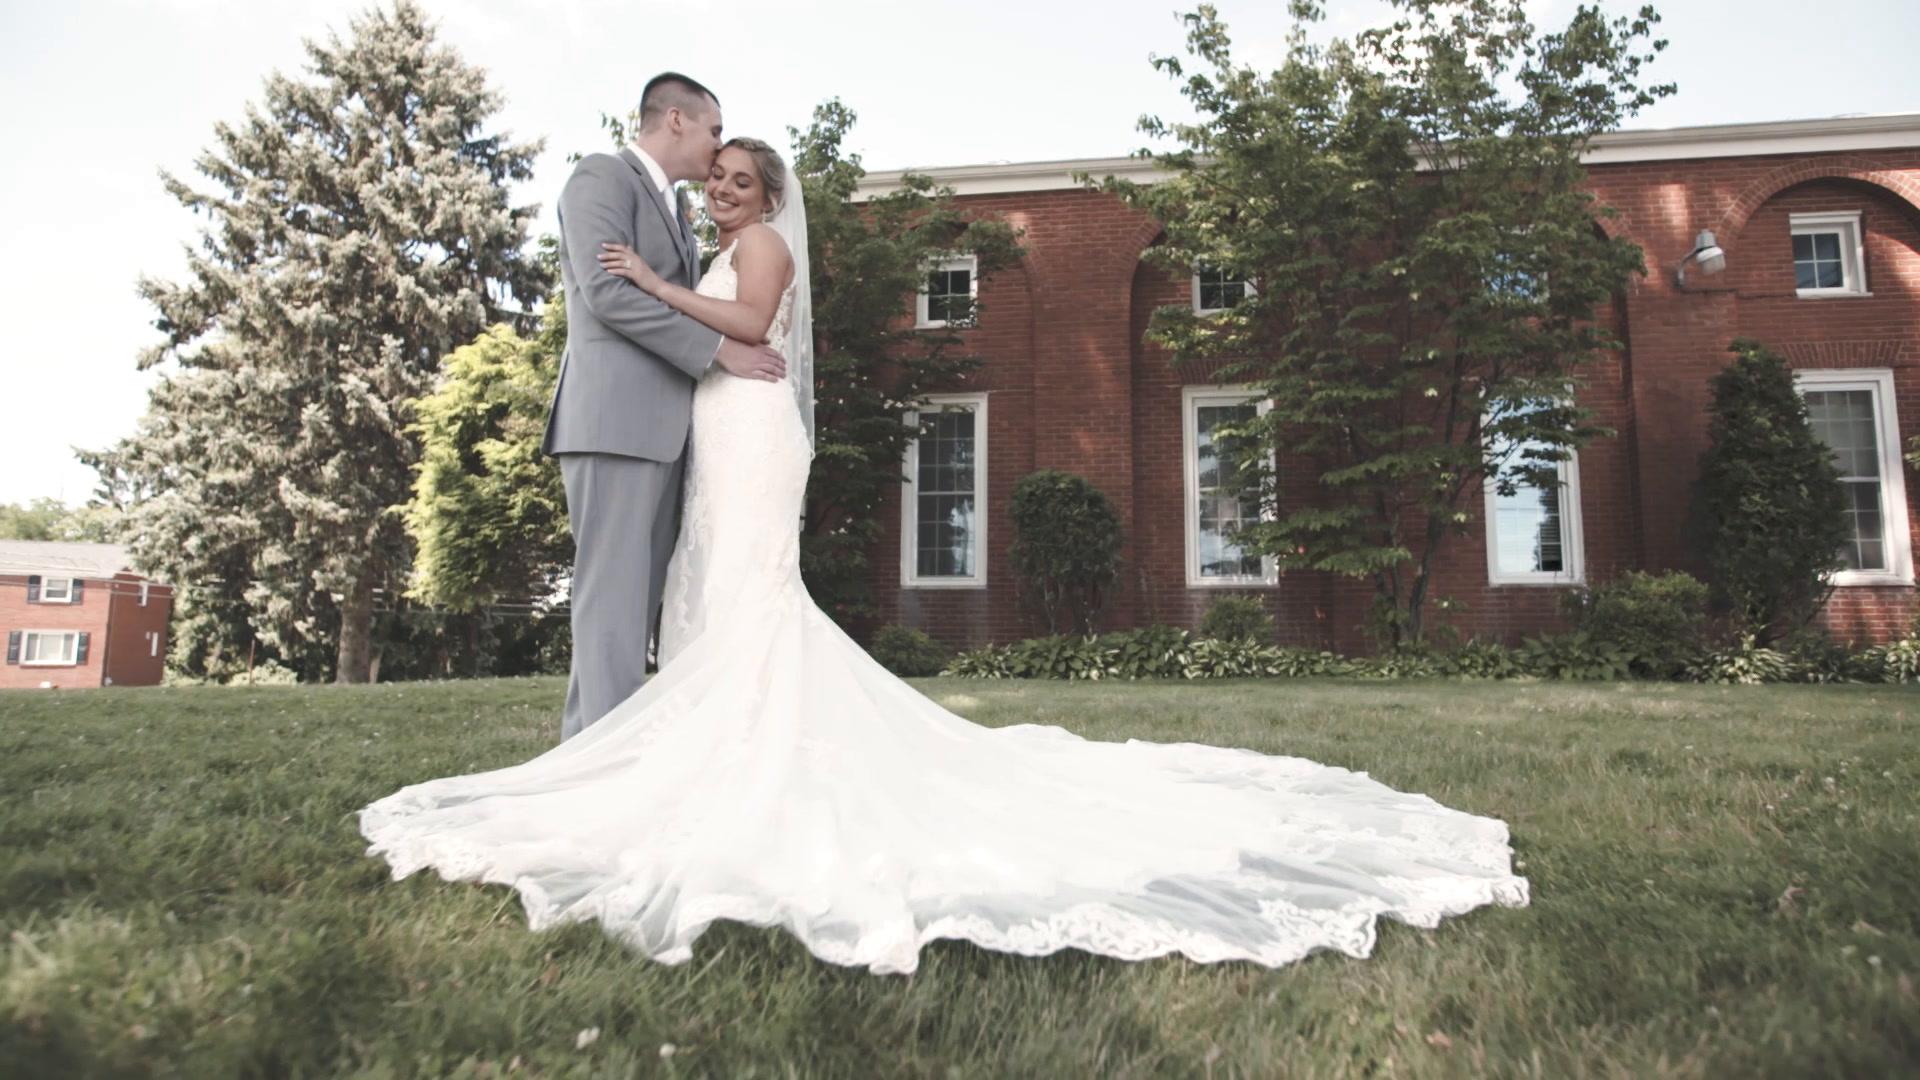 Stephanie + Dan | Elizabeth, Pennsylvania | The Sunset Room